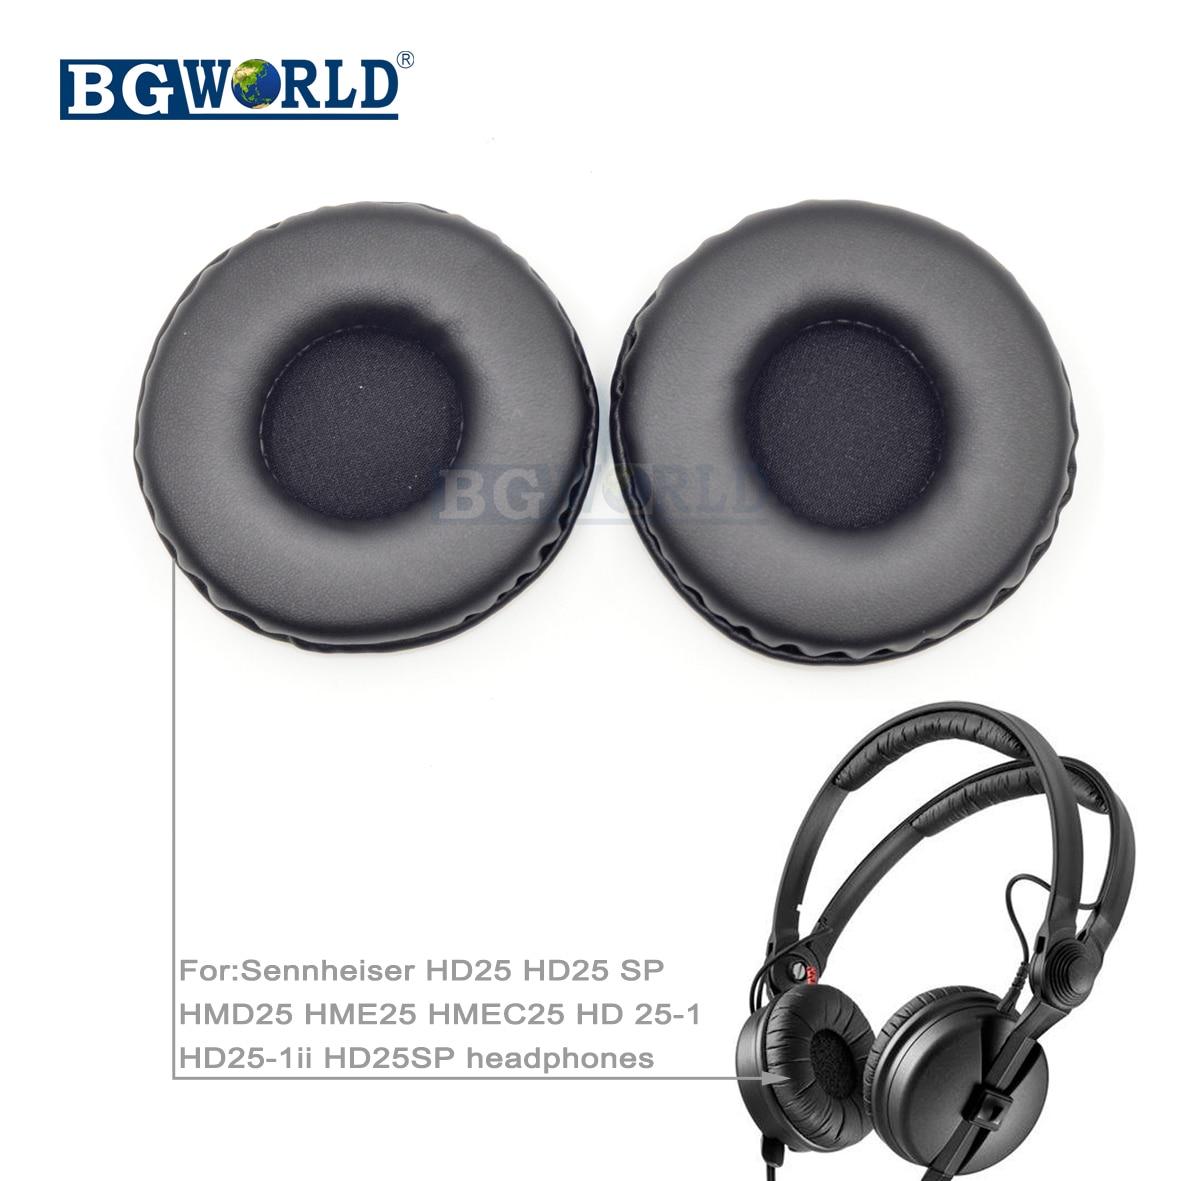 2 pairs Ear Pads  For Sennheiser HD25-1 HD25 HMD25 HME25 HMEC 25 45 Headphones